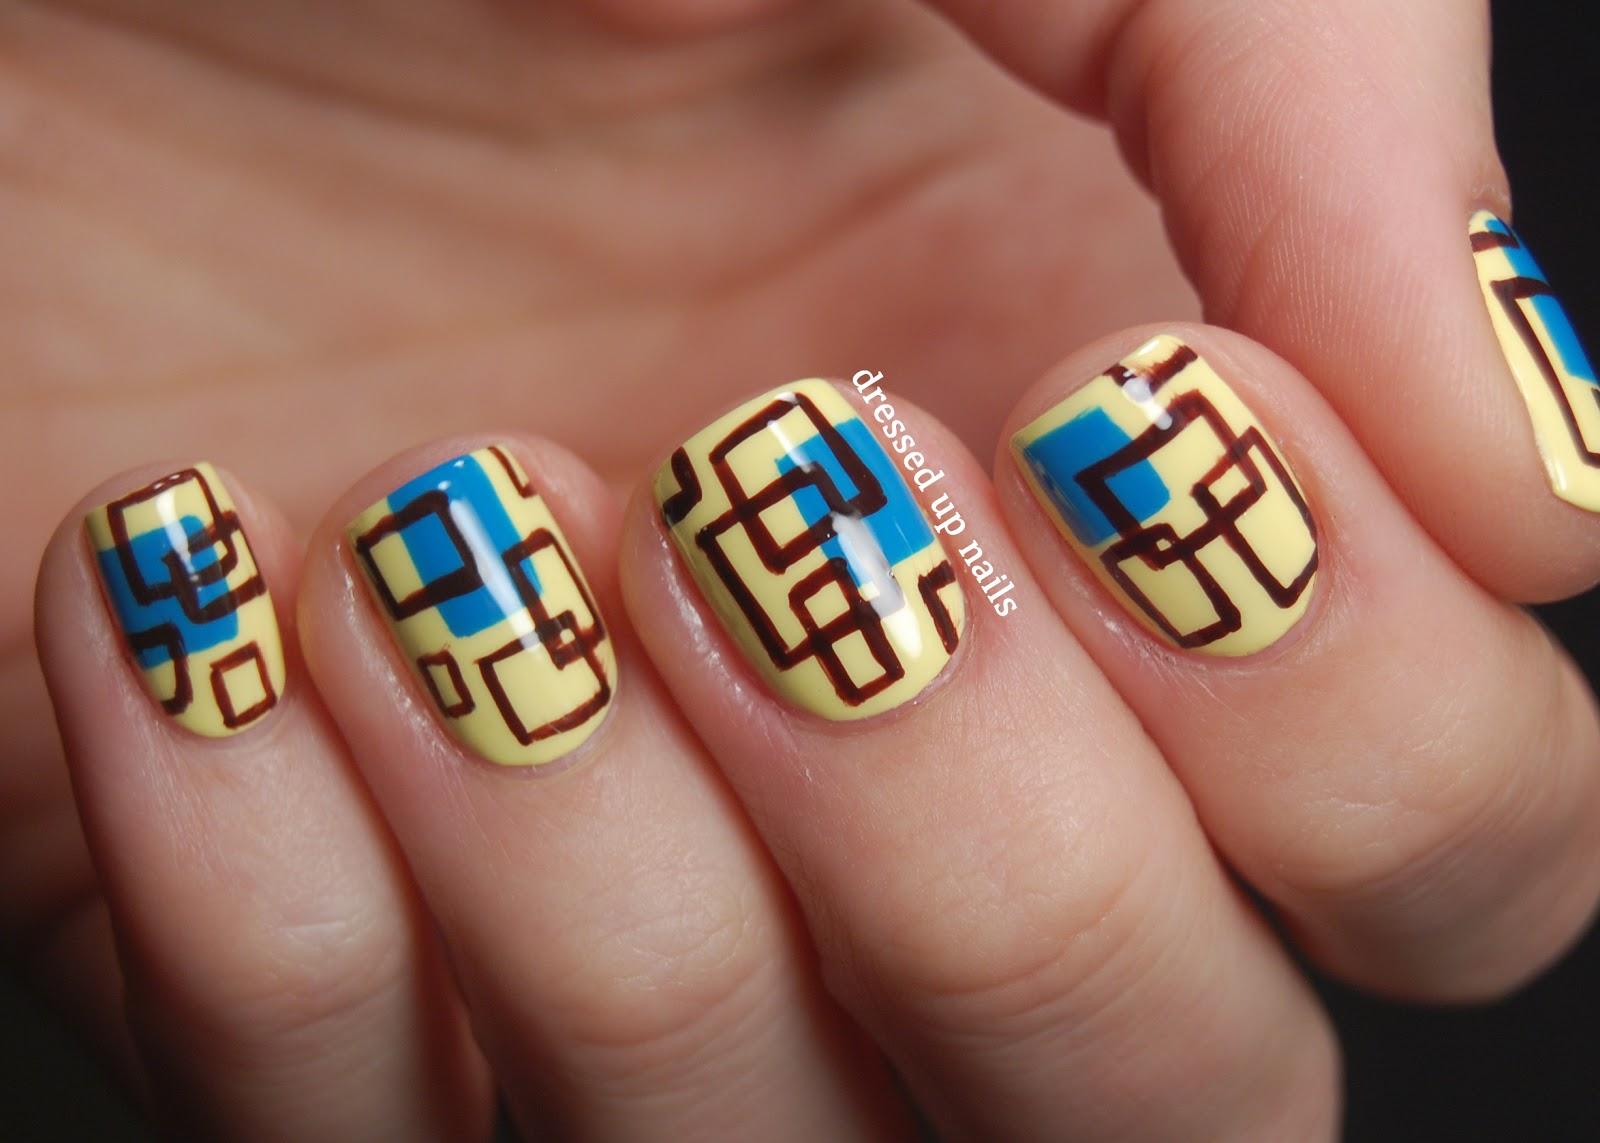 Nail Art Ideas » Nail Art Murray Ky - Pictures of Nail Art Design Ideas